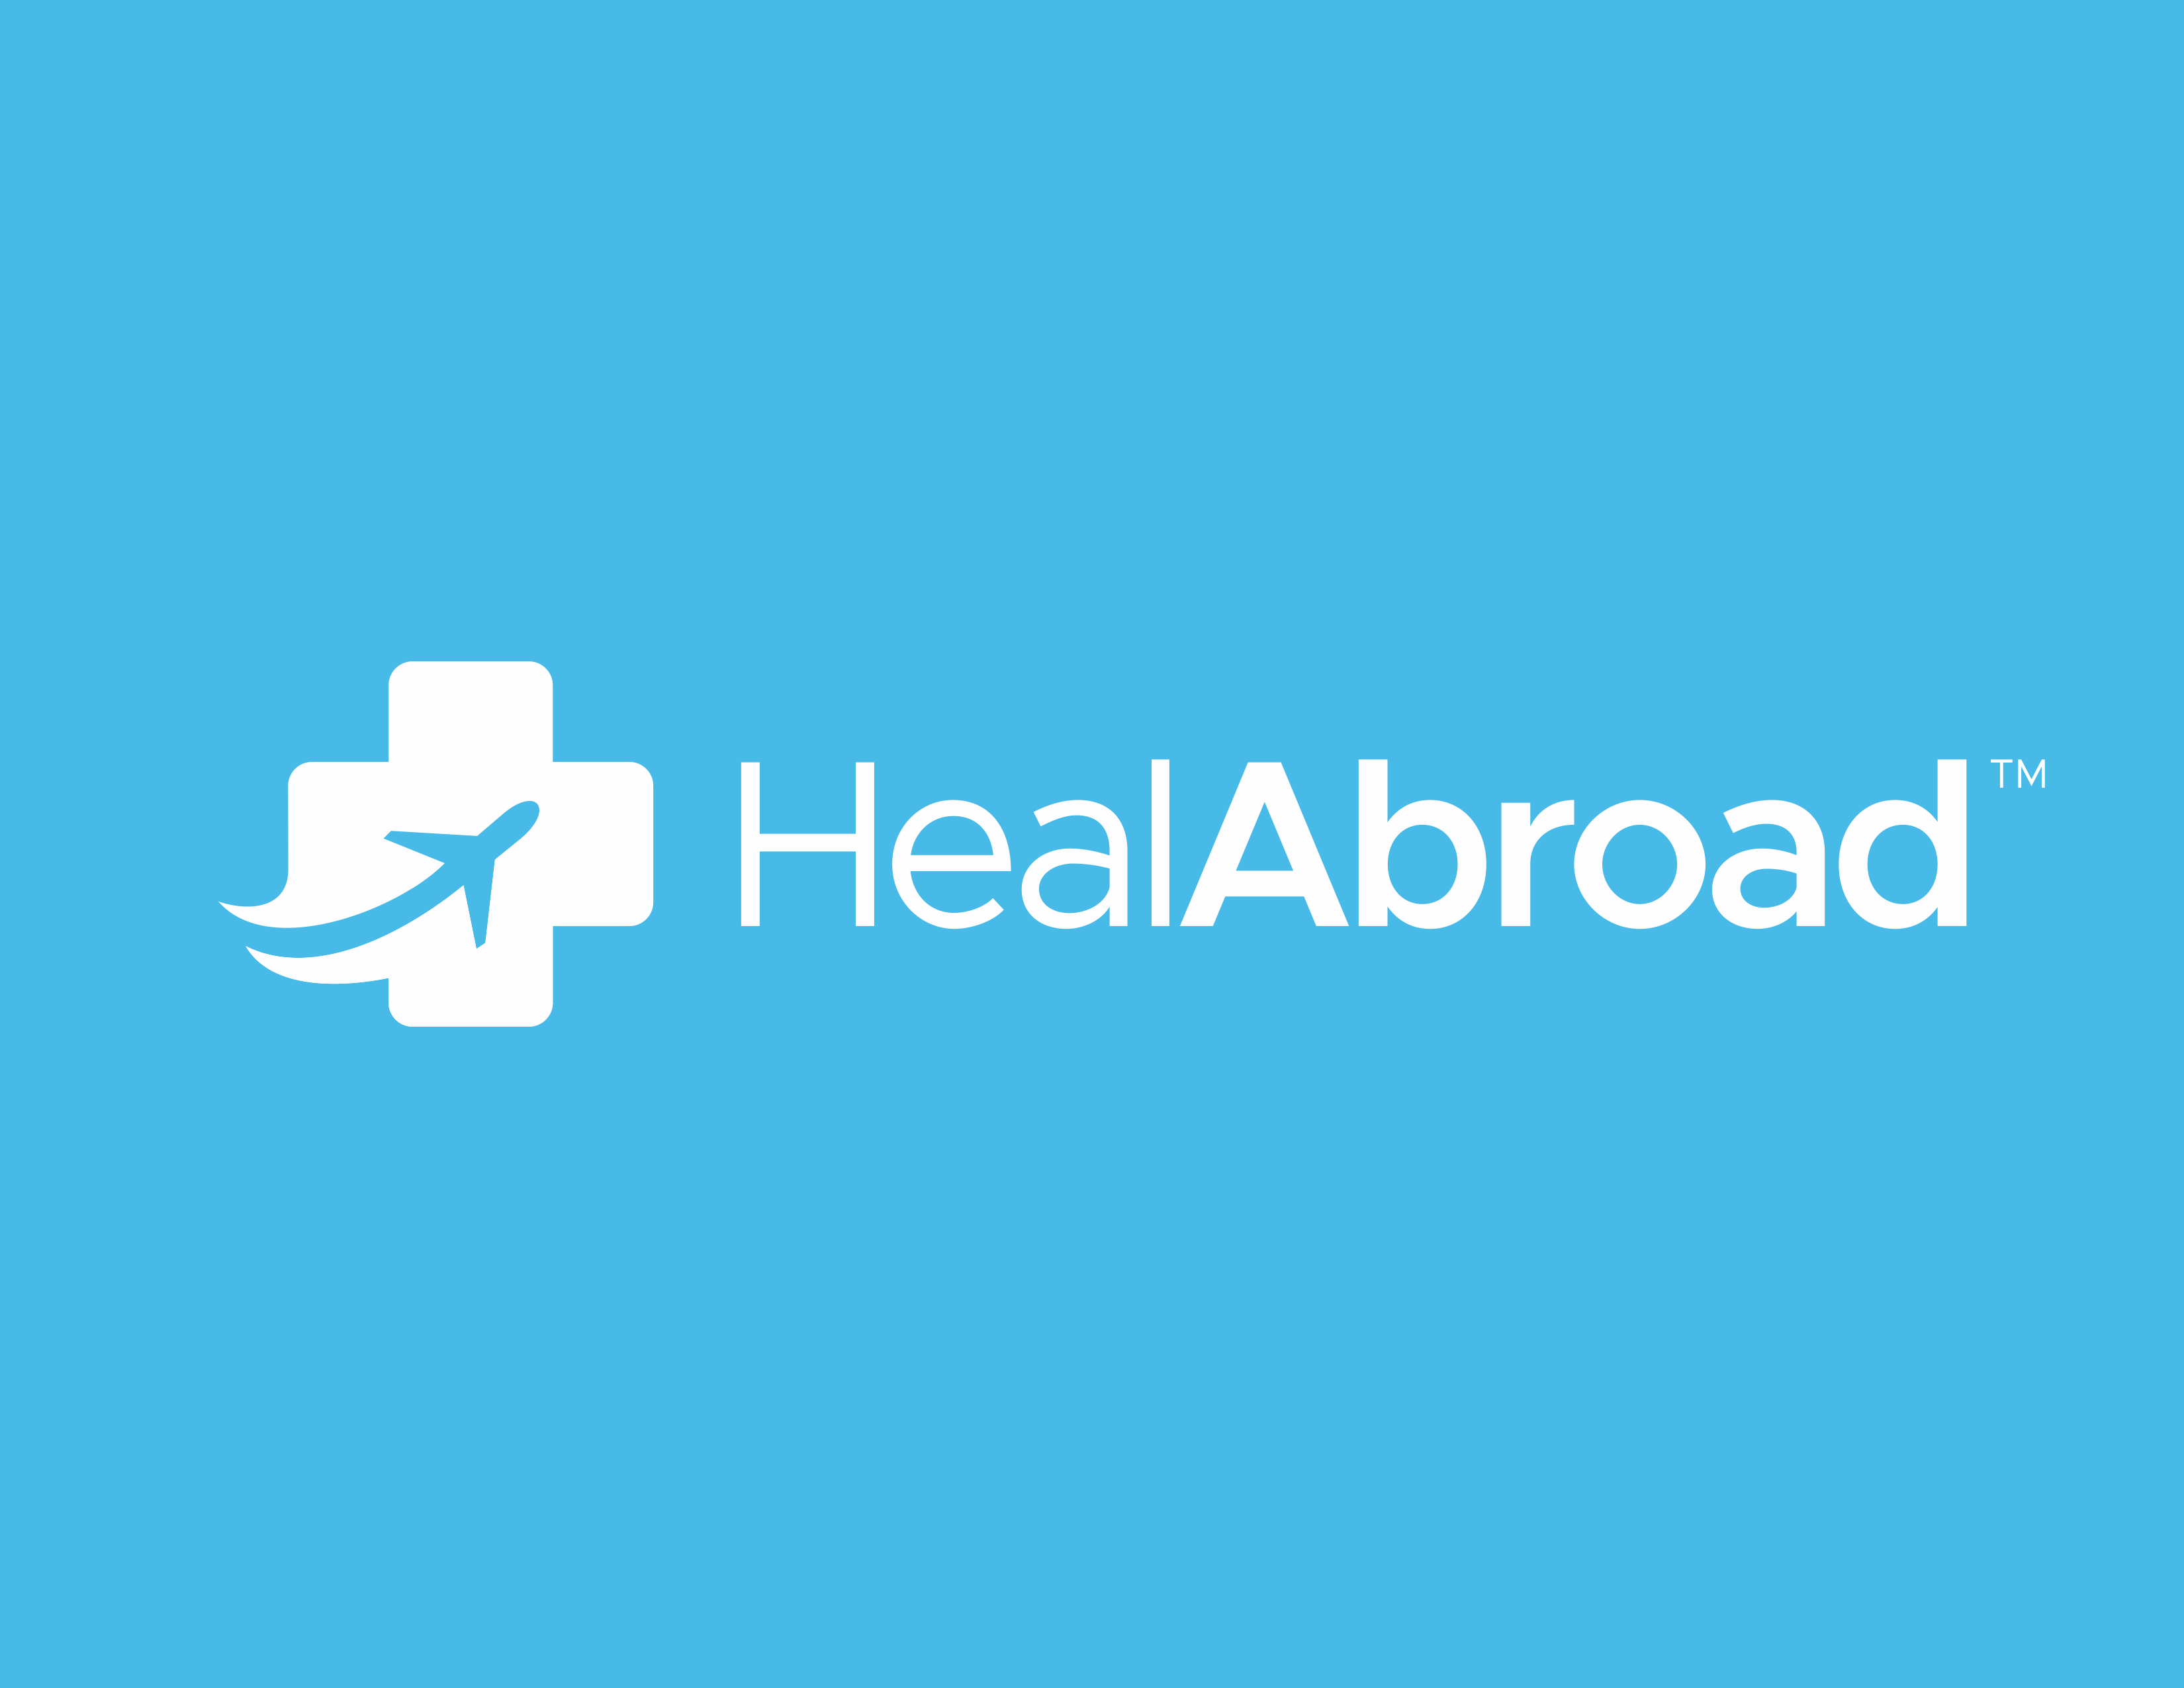 Design a simple, creative, and modern medical tourism logo